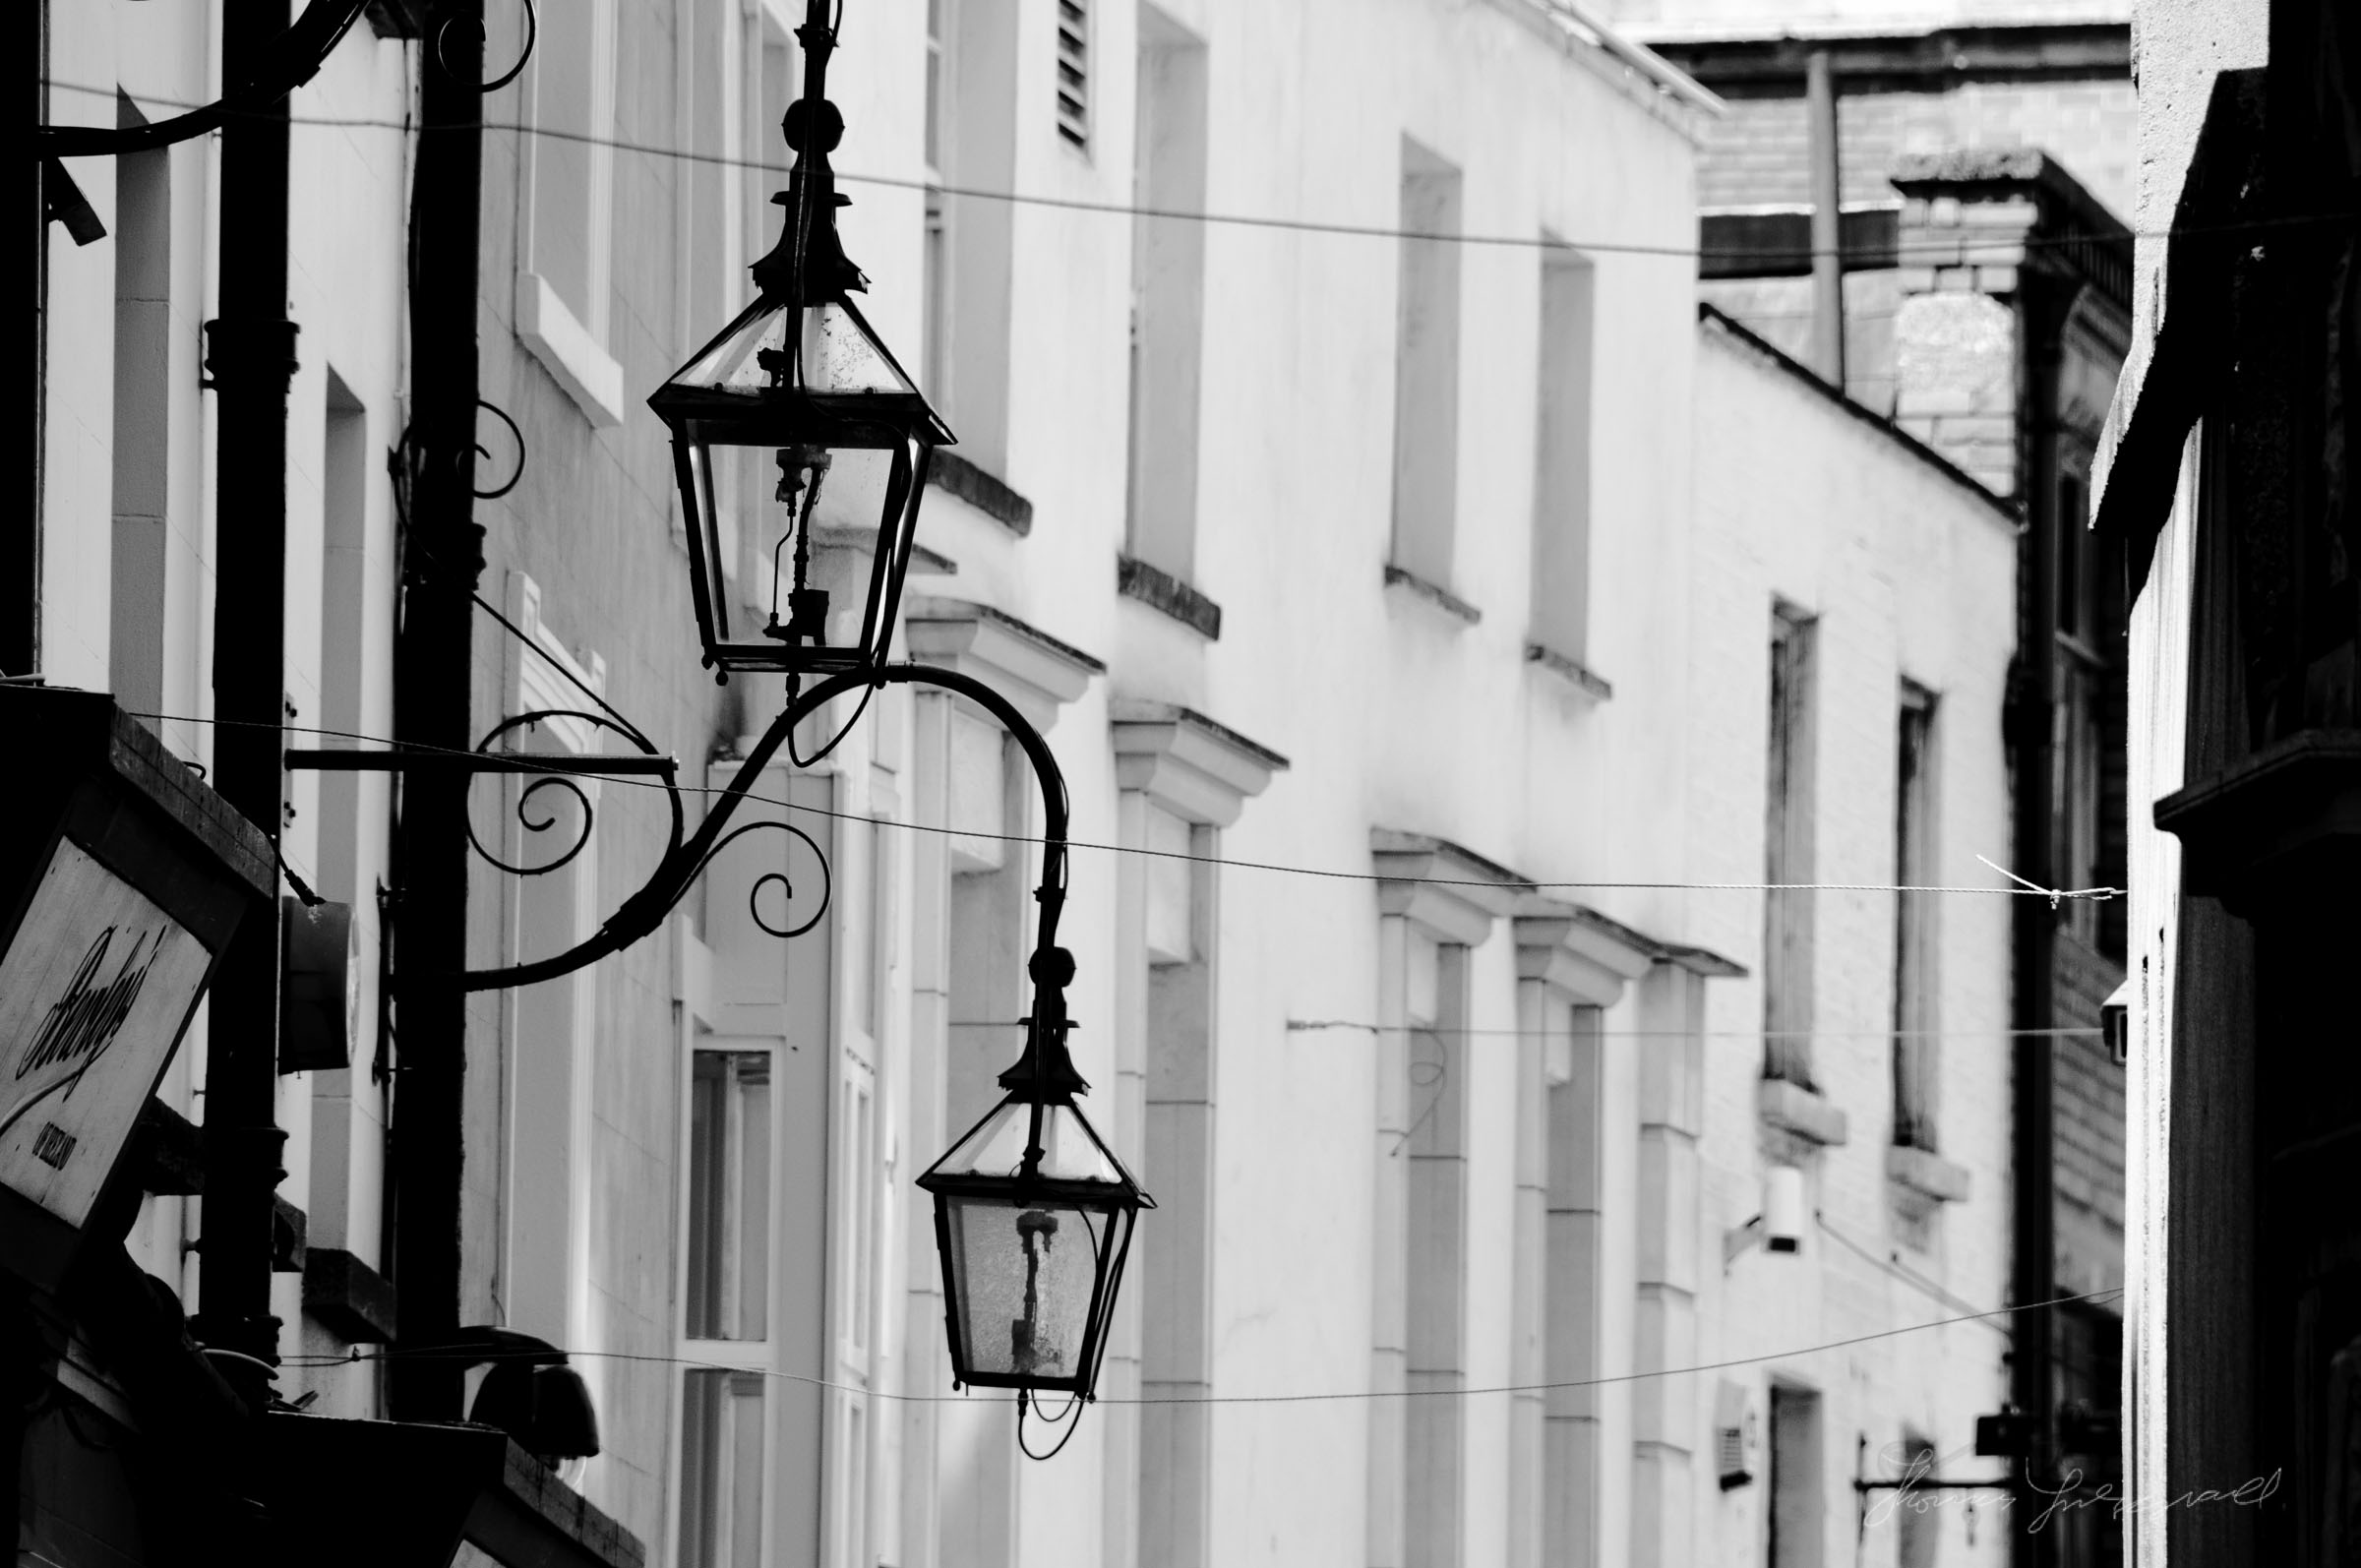 Streets-of-Dublin-Photo-0448.jpg